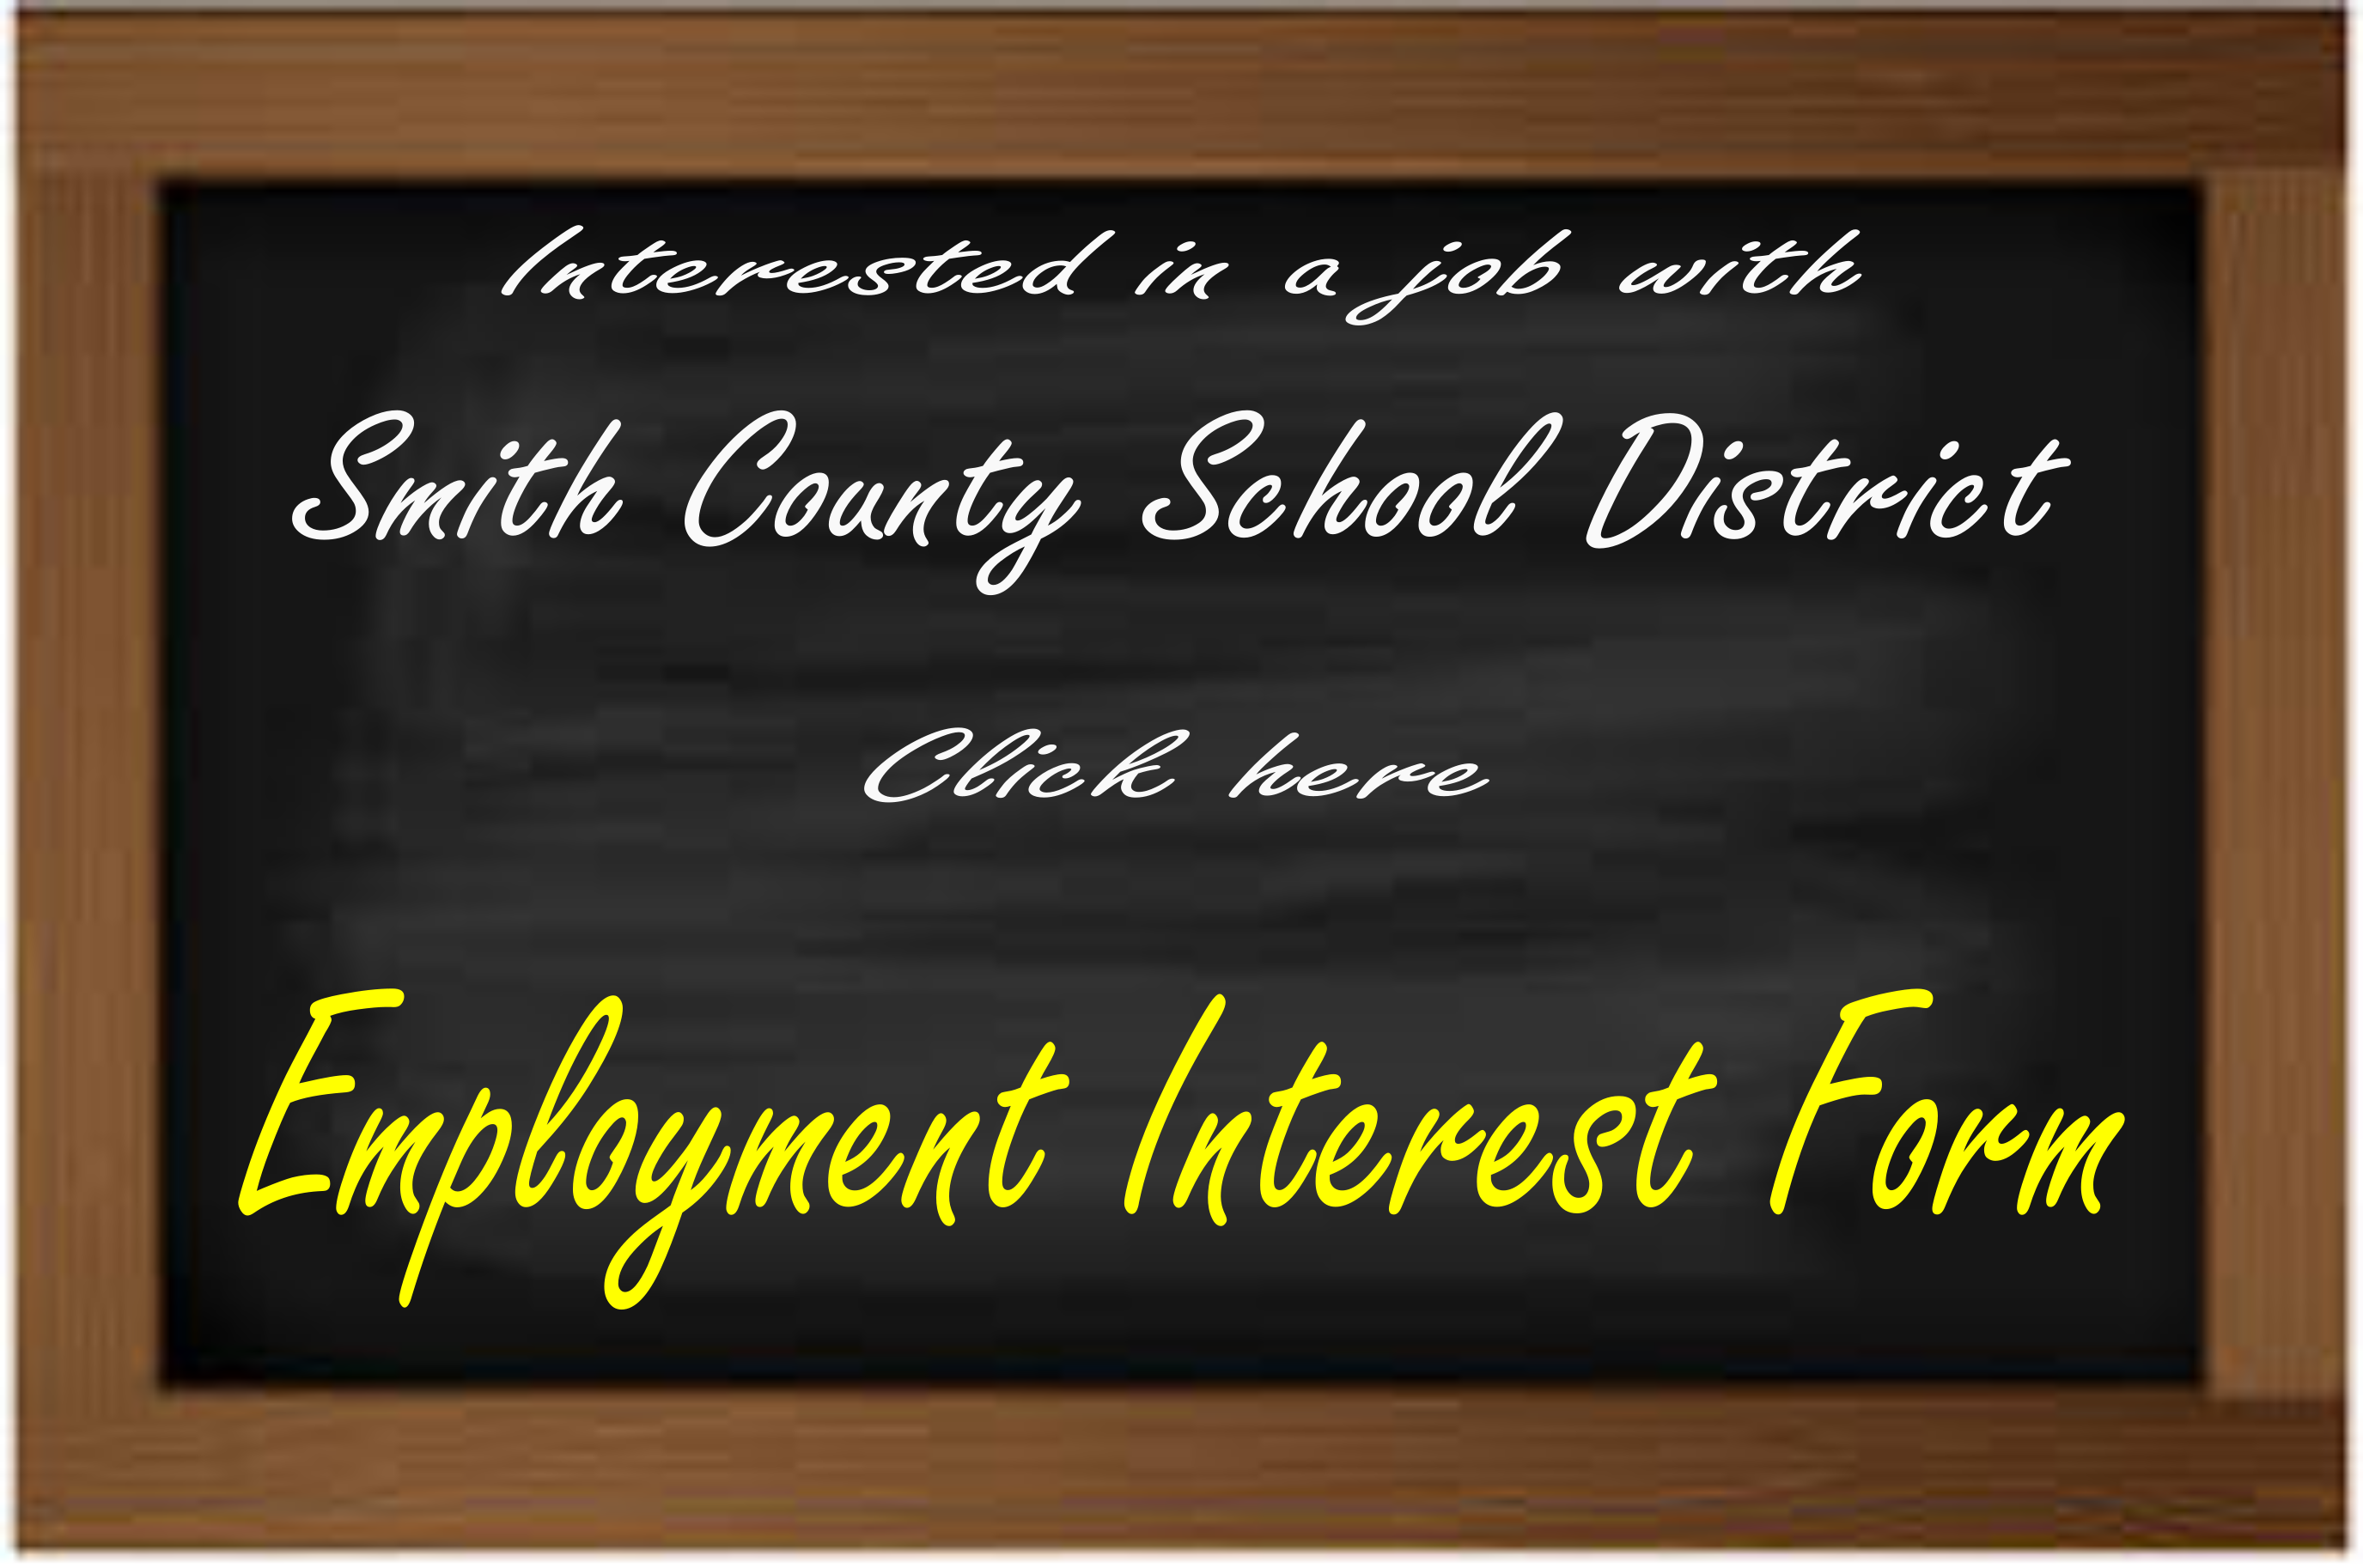 Employment Interest Form